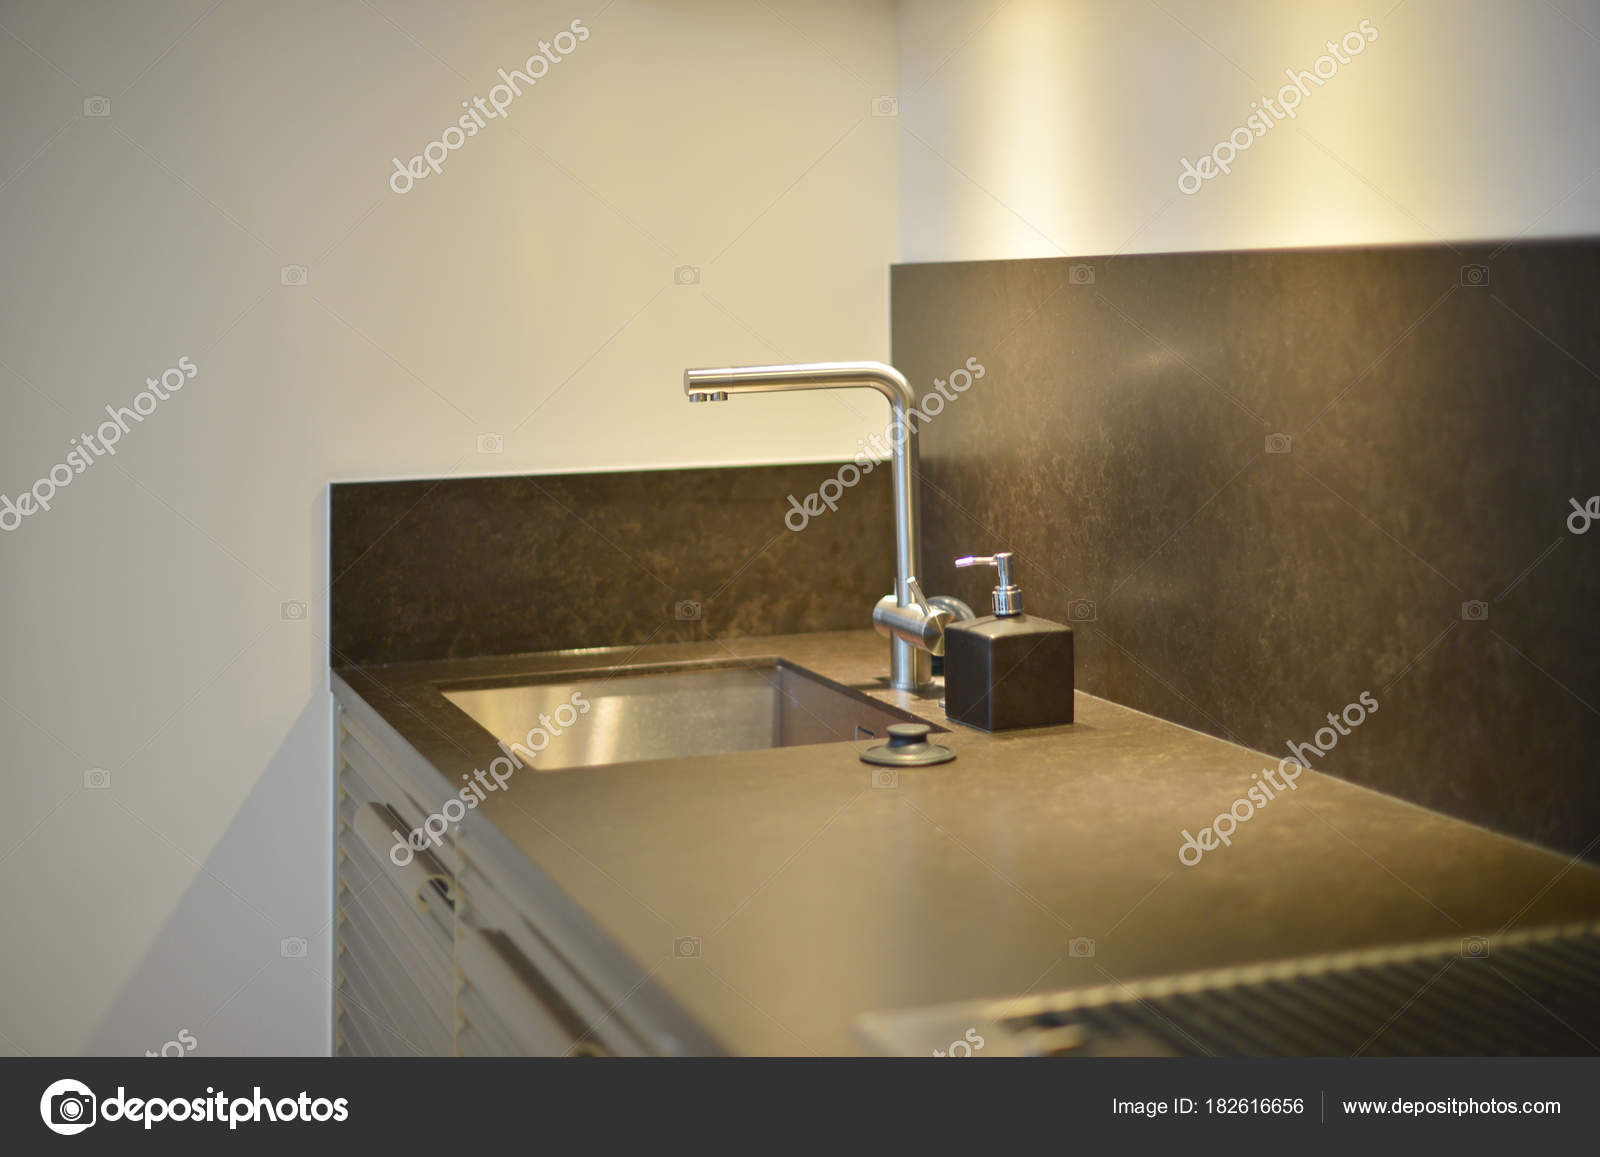 black sink kitchen aunt jemima curtains 厨房带照明的黑色水槽上的豪华水龙头 图库照片 c tampatra hotmail com